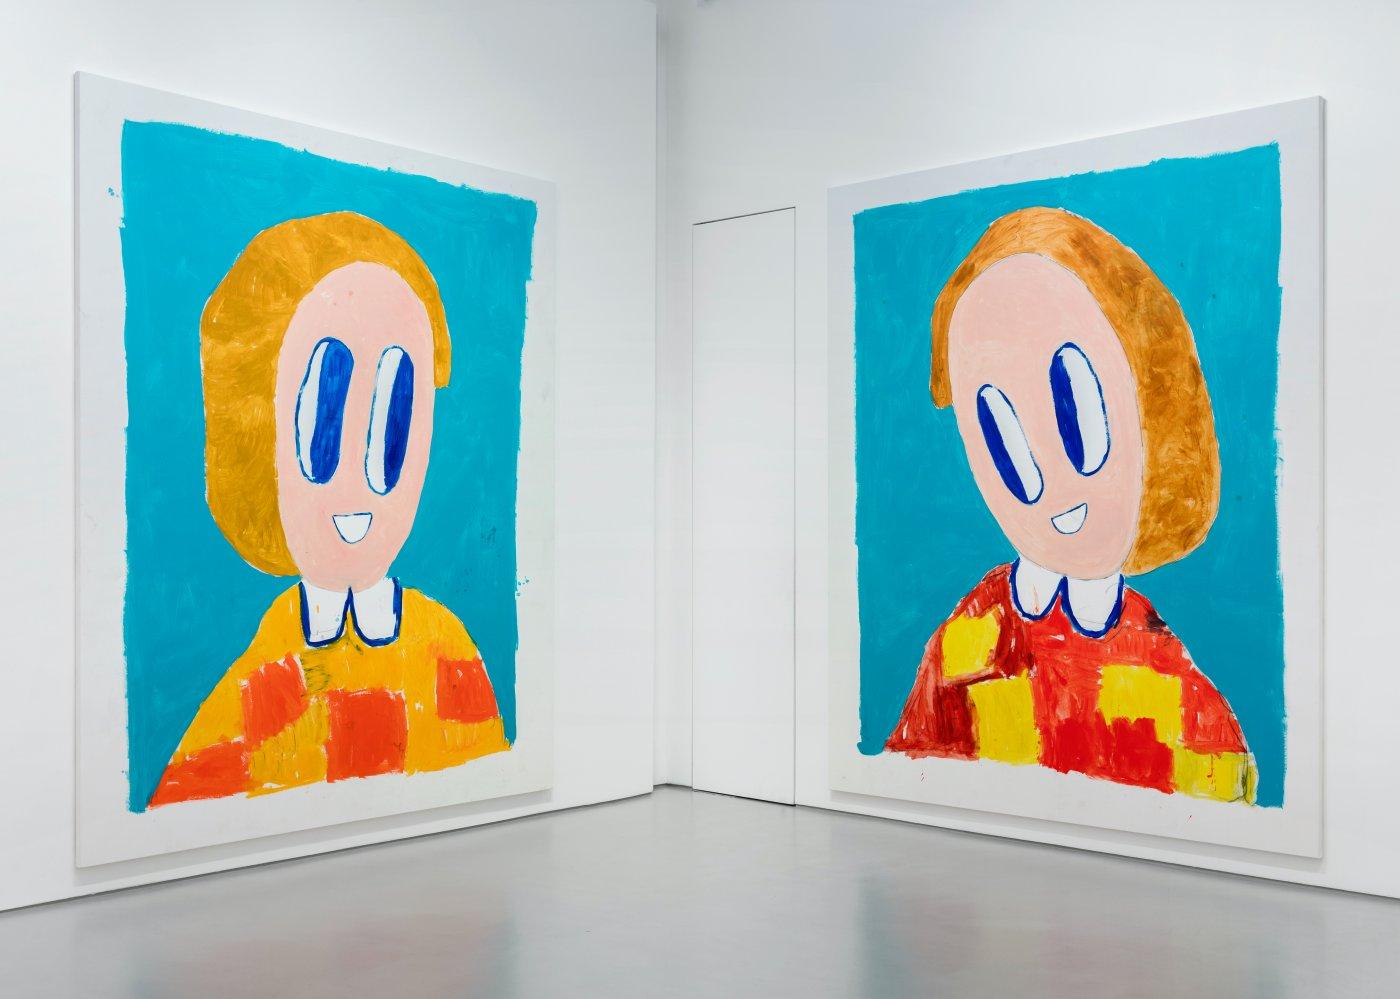 Galerie Max Hetzler Paris Andre Butzer 2